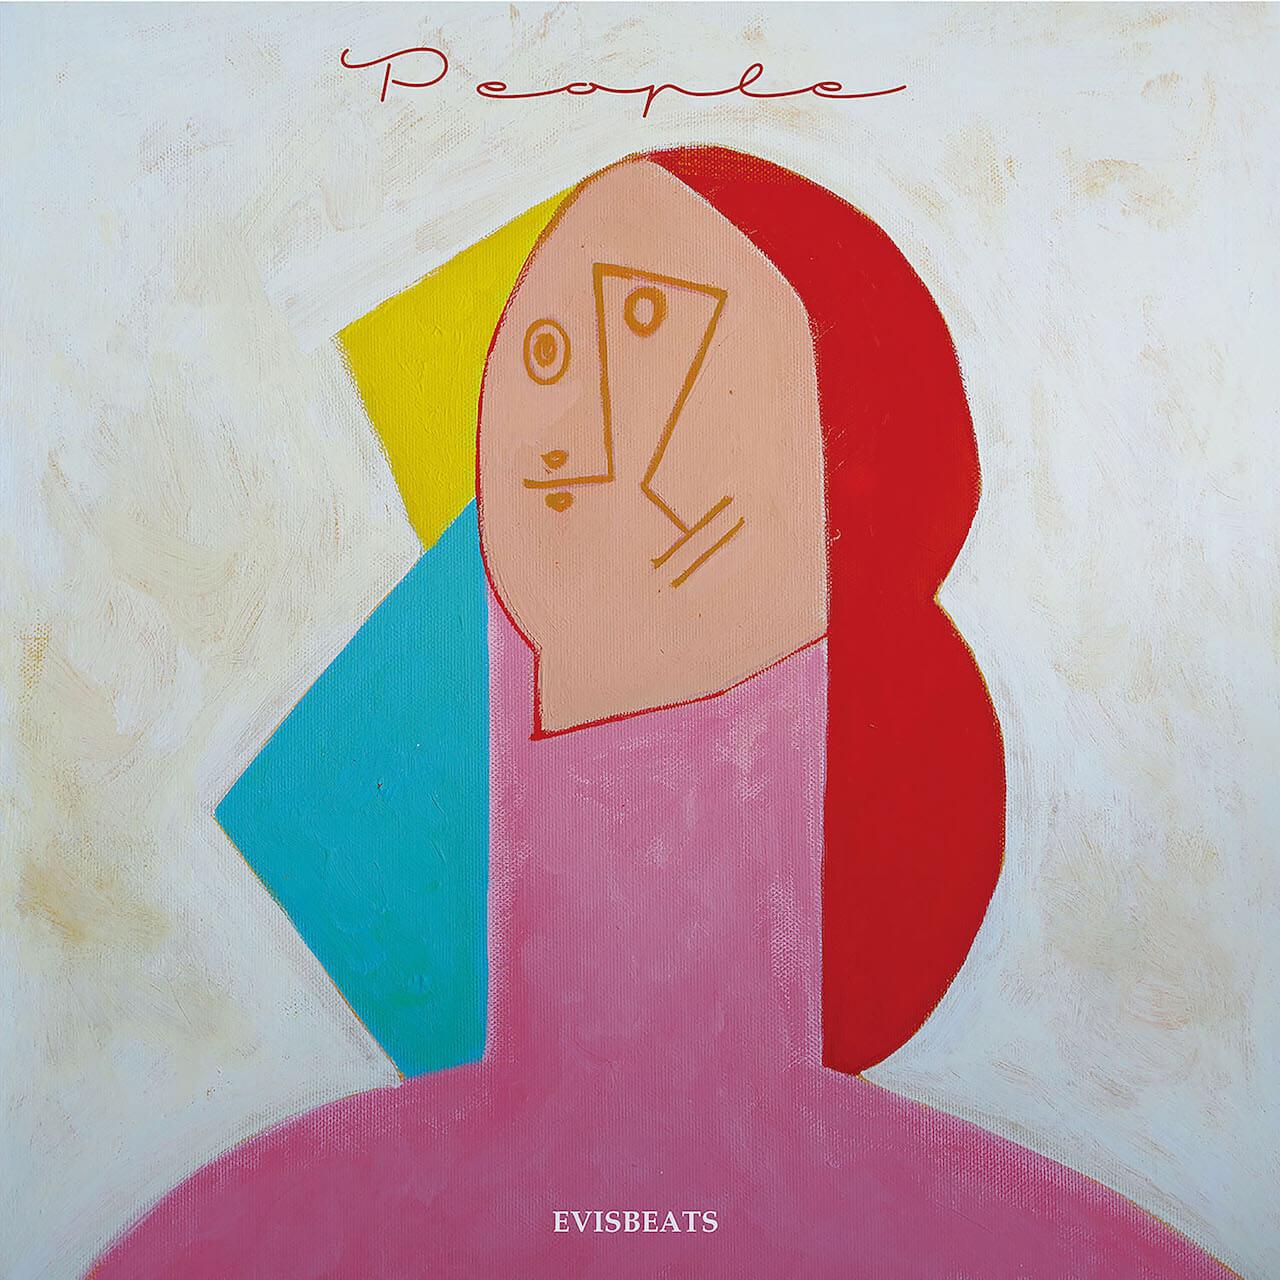 EVISBEATSの最新アルバム「PEOPLE」が本日発売|さらにサブスク・ストリーミングが全面解禁 music191218-evisbeats-1